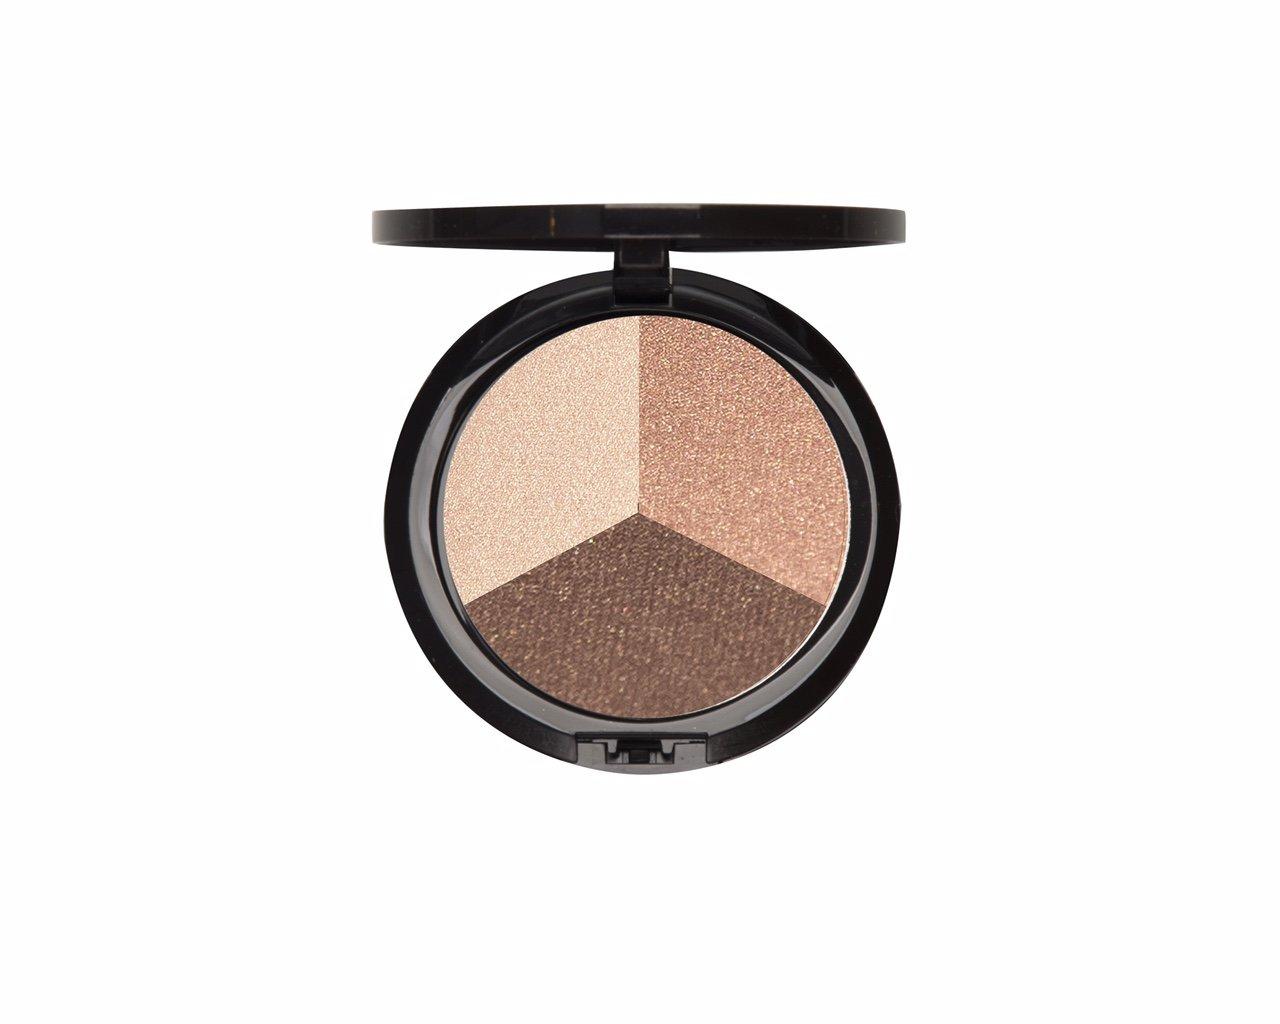 Iman Cosmetics Contour Trio Foreplay